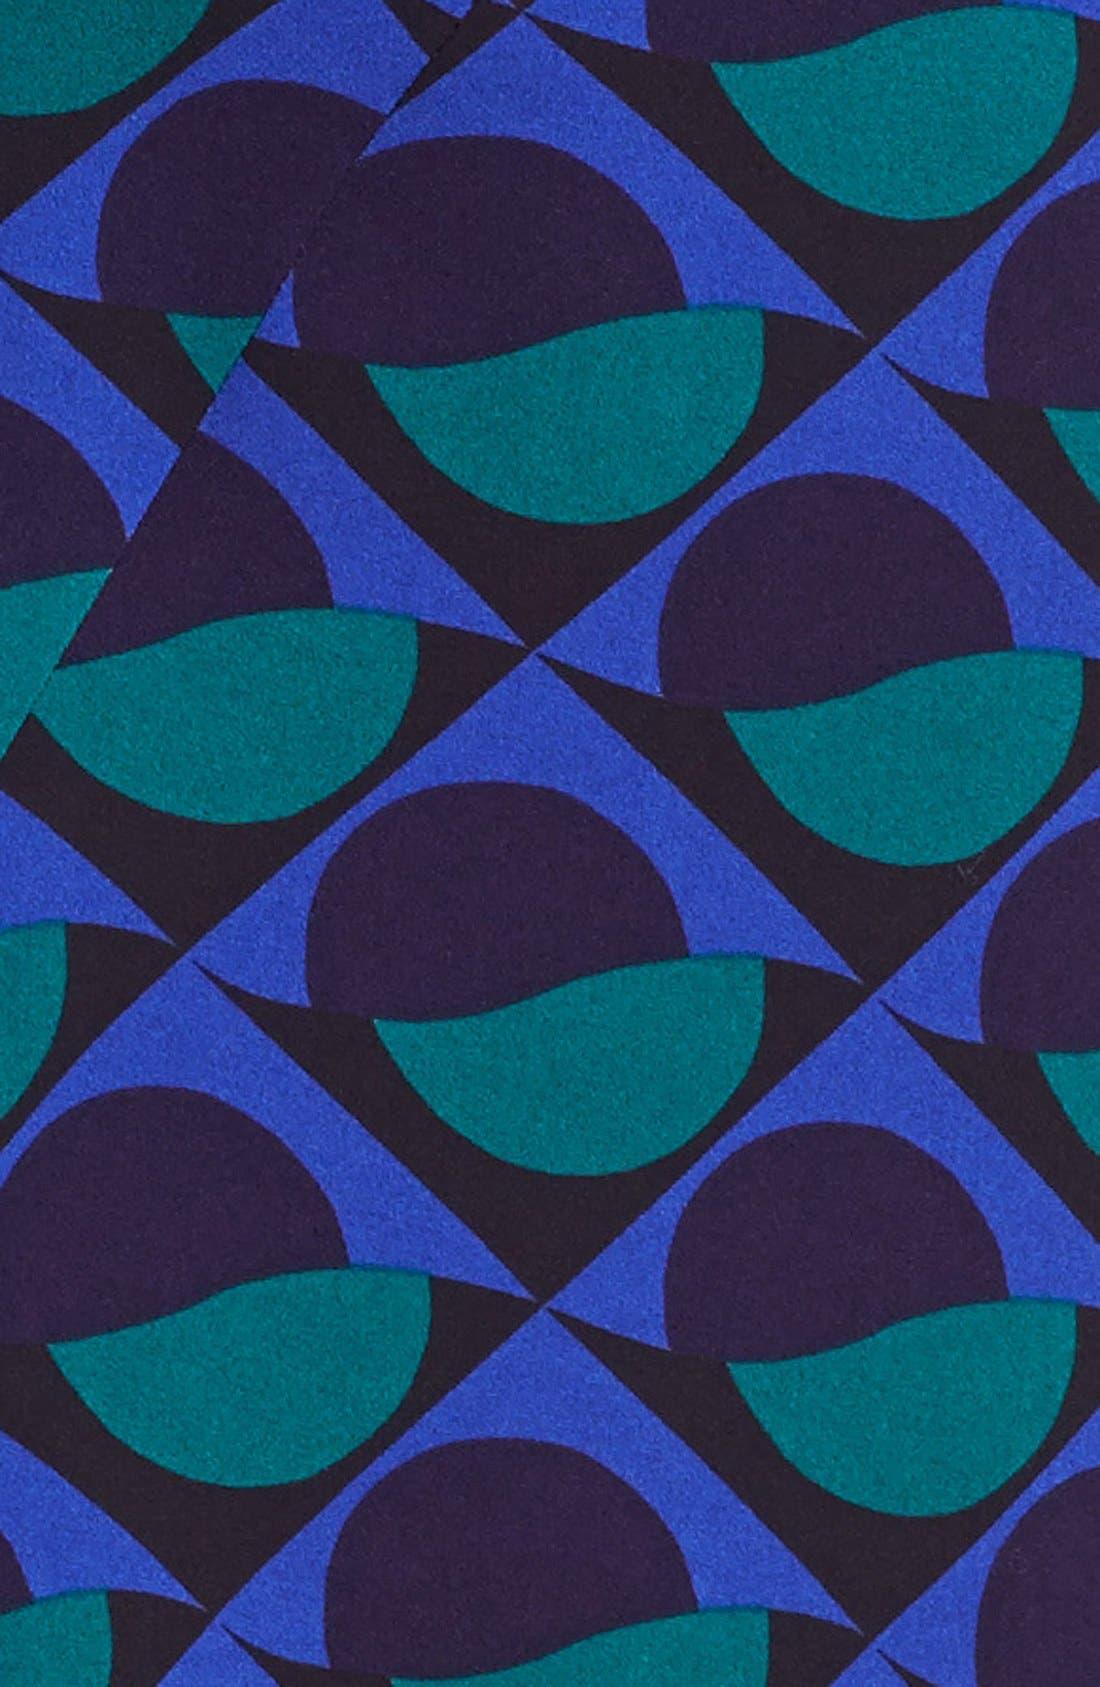 Alternate Image 3  - MARC BY MARC JACOBS 'Etta' Print Pencil Skirt